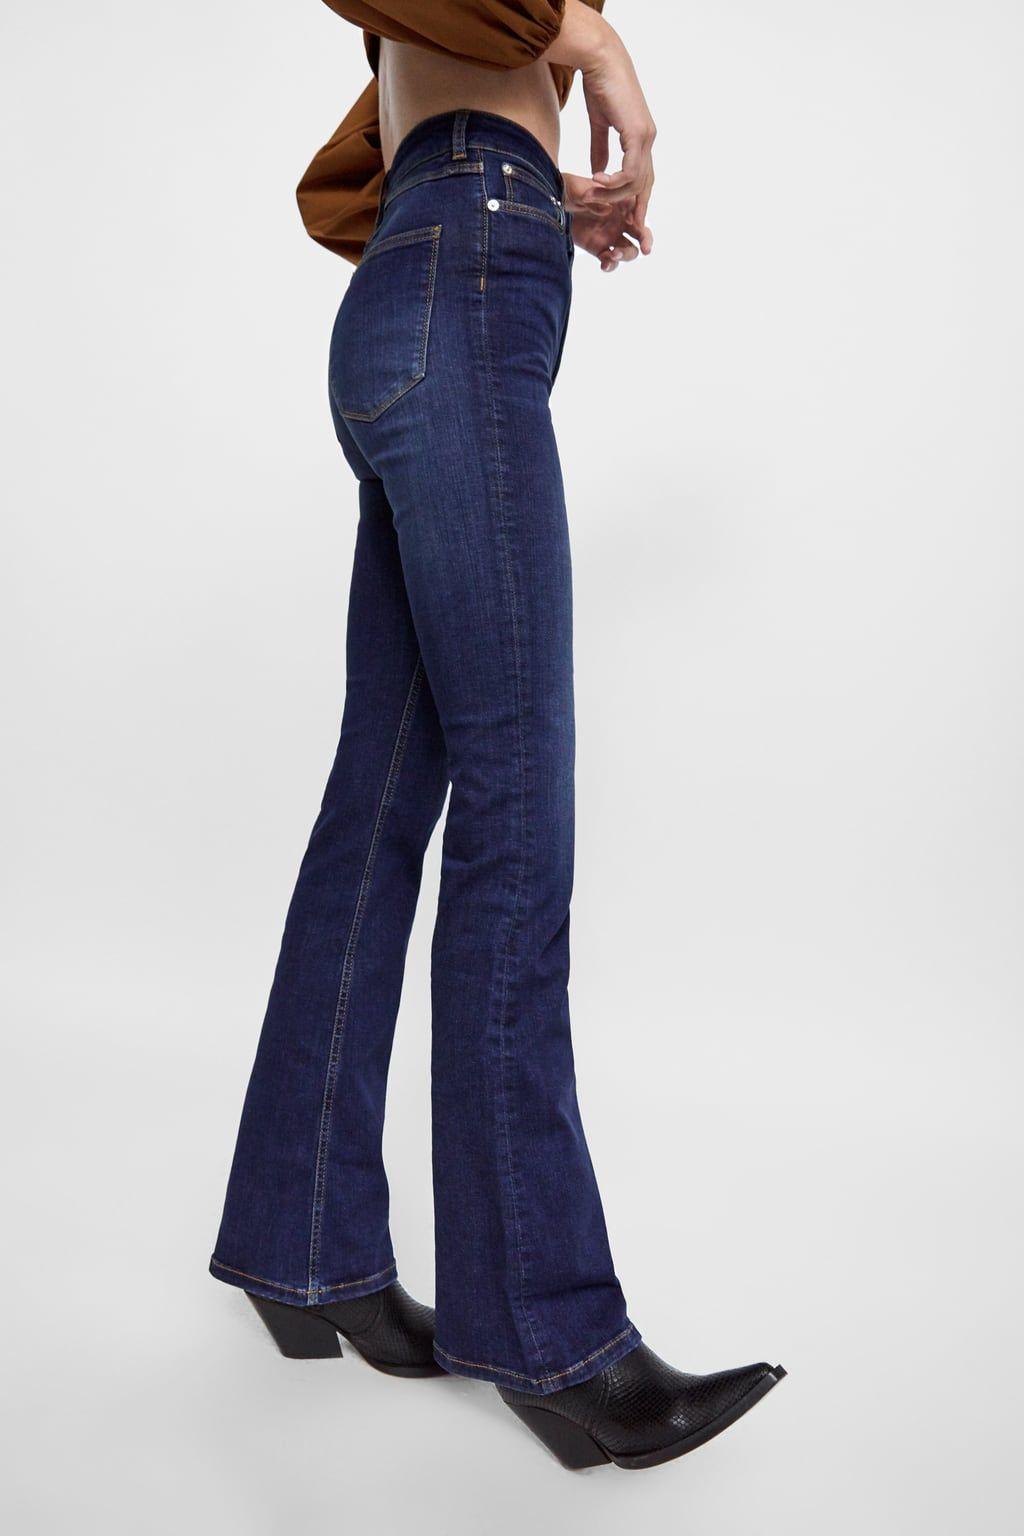 69663bae Zw premium skinny flare sena blue jeans | Fall 2019 | Blue jeans ...